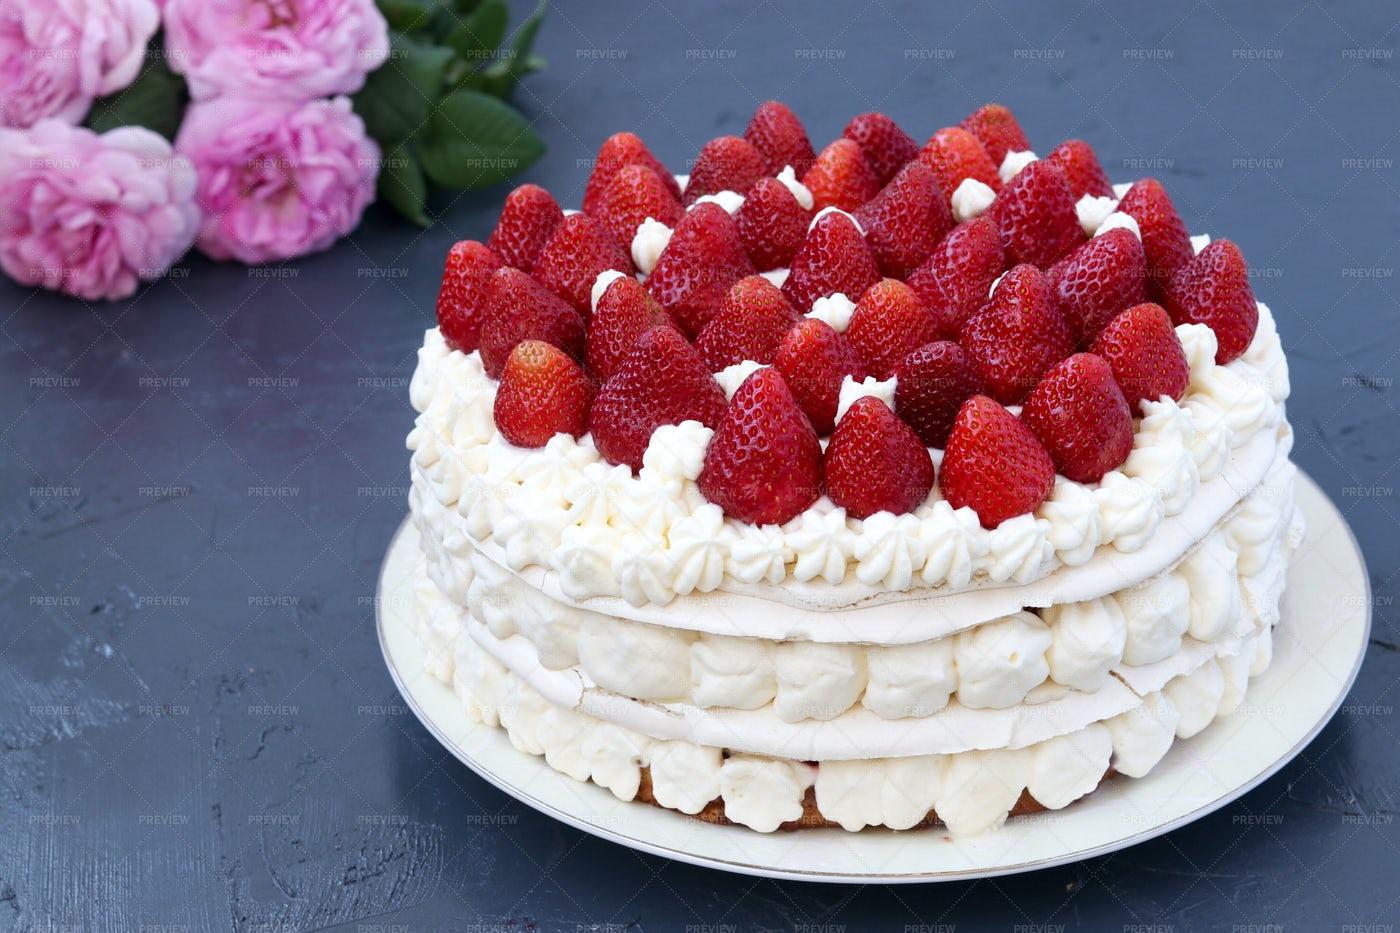 Pavlova Cake With Strawberries: Stock Photos